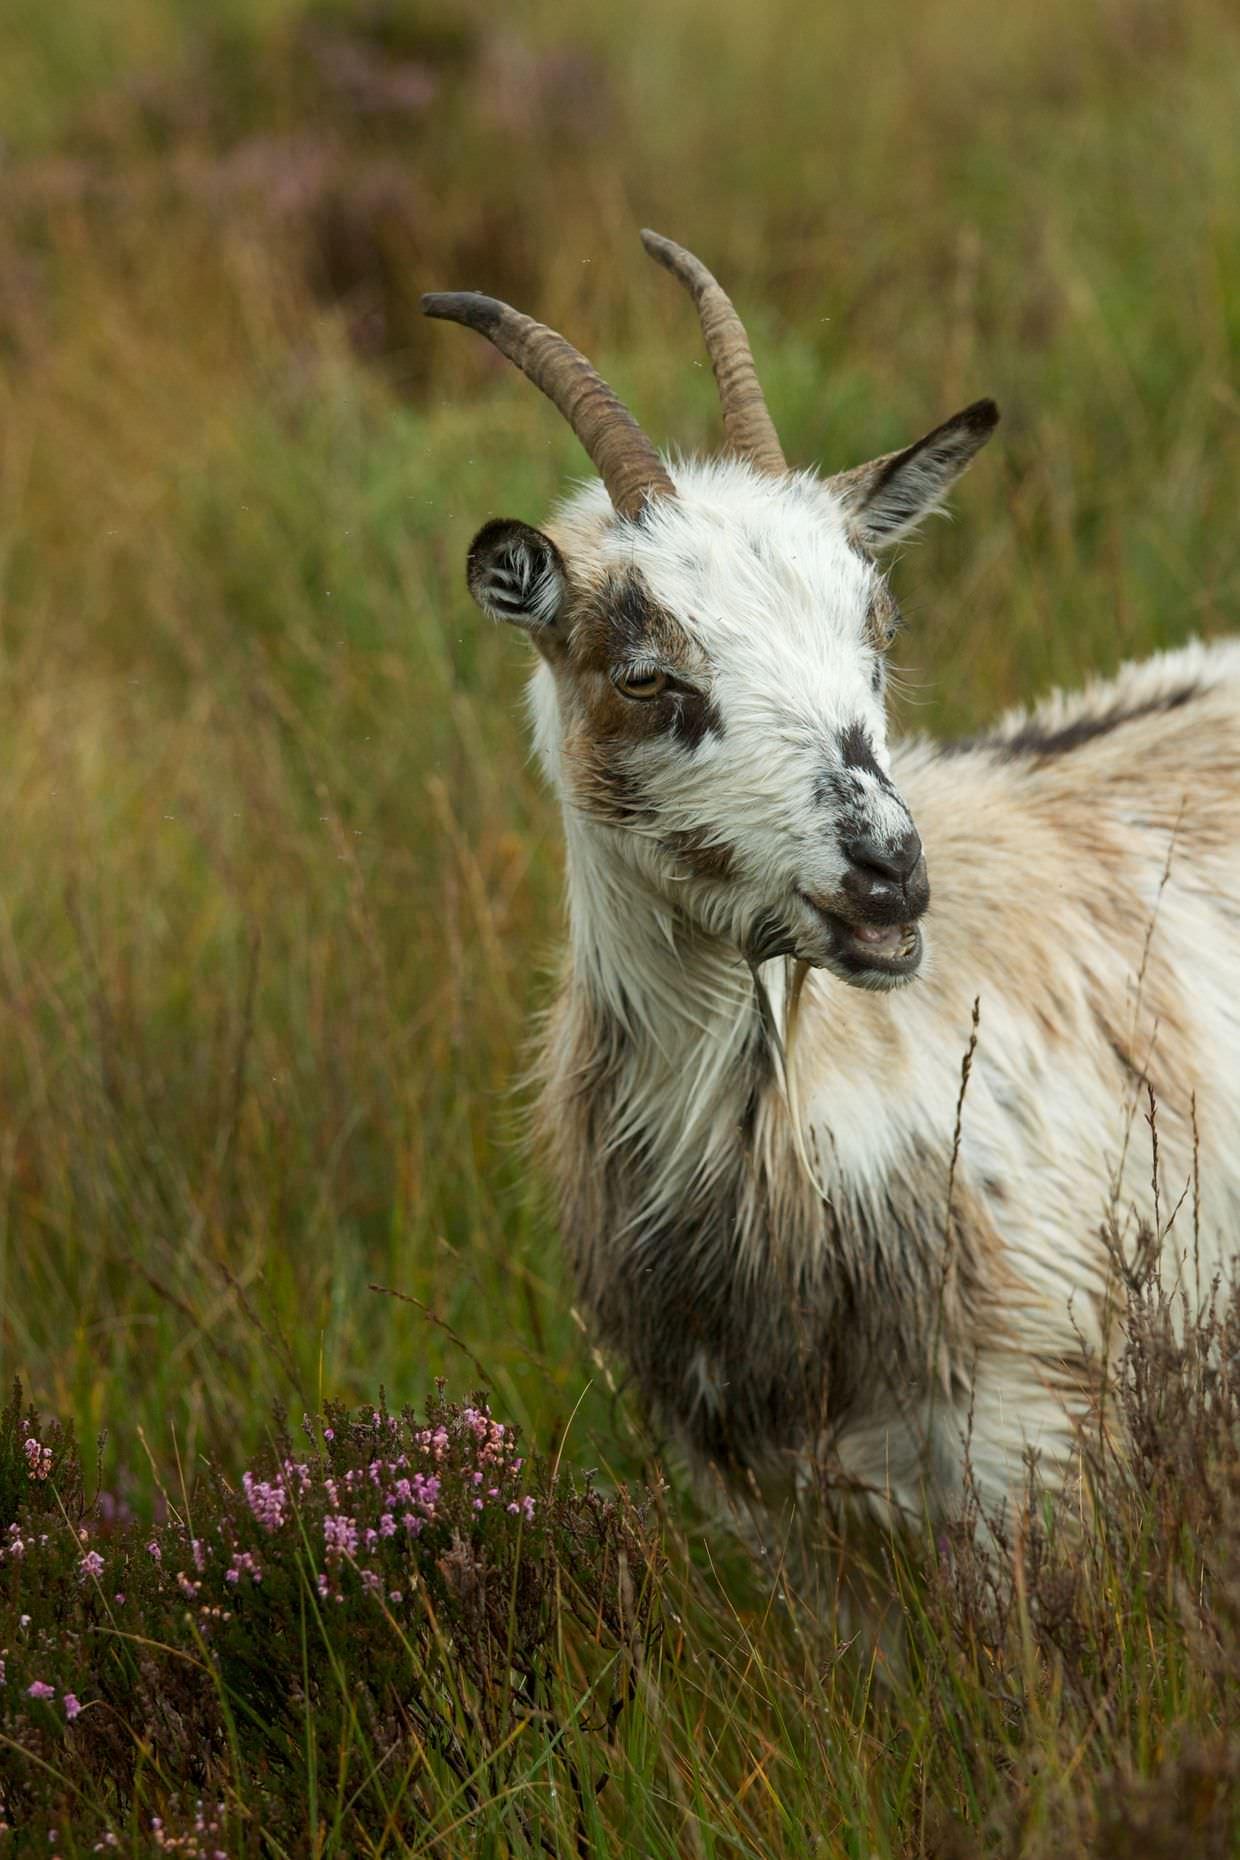 A wild goat